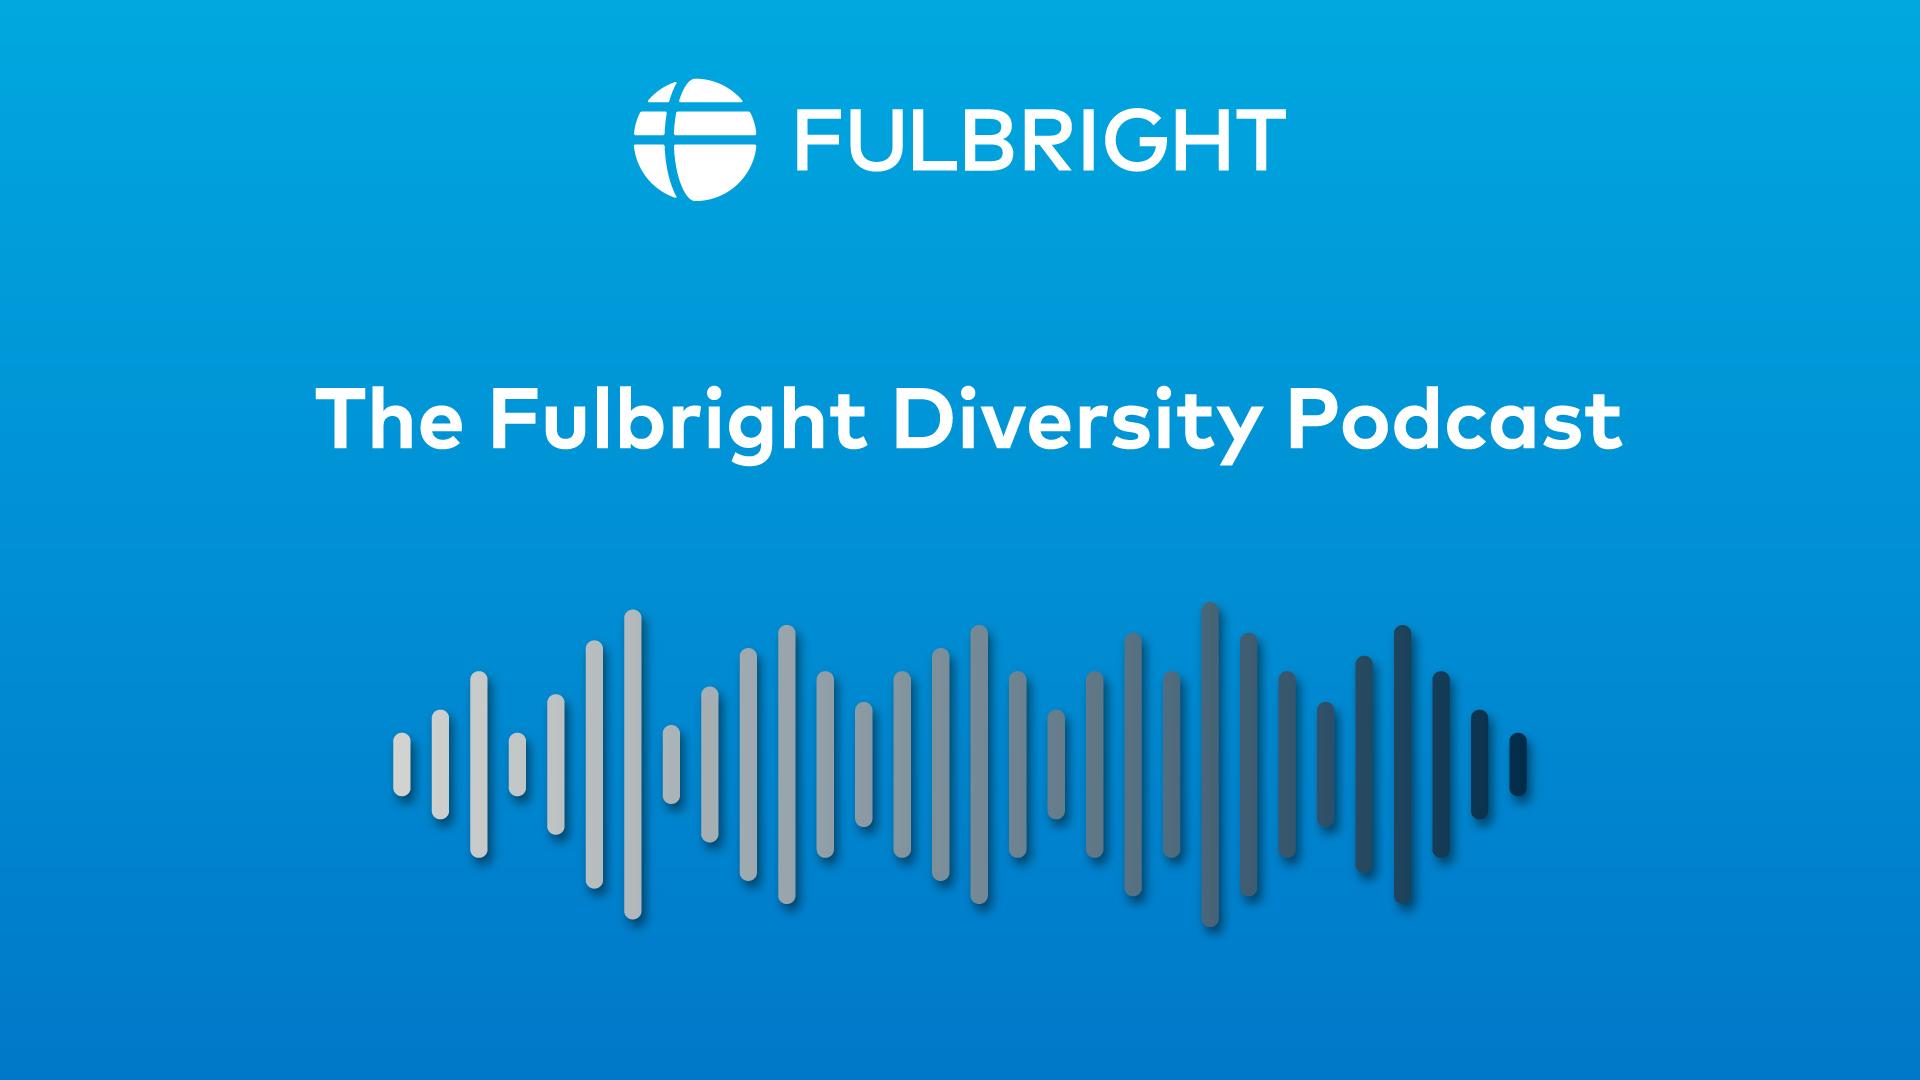 New Fulbright Diversity Podcast